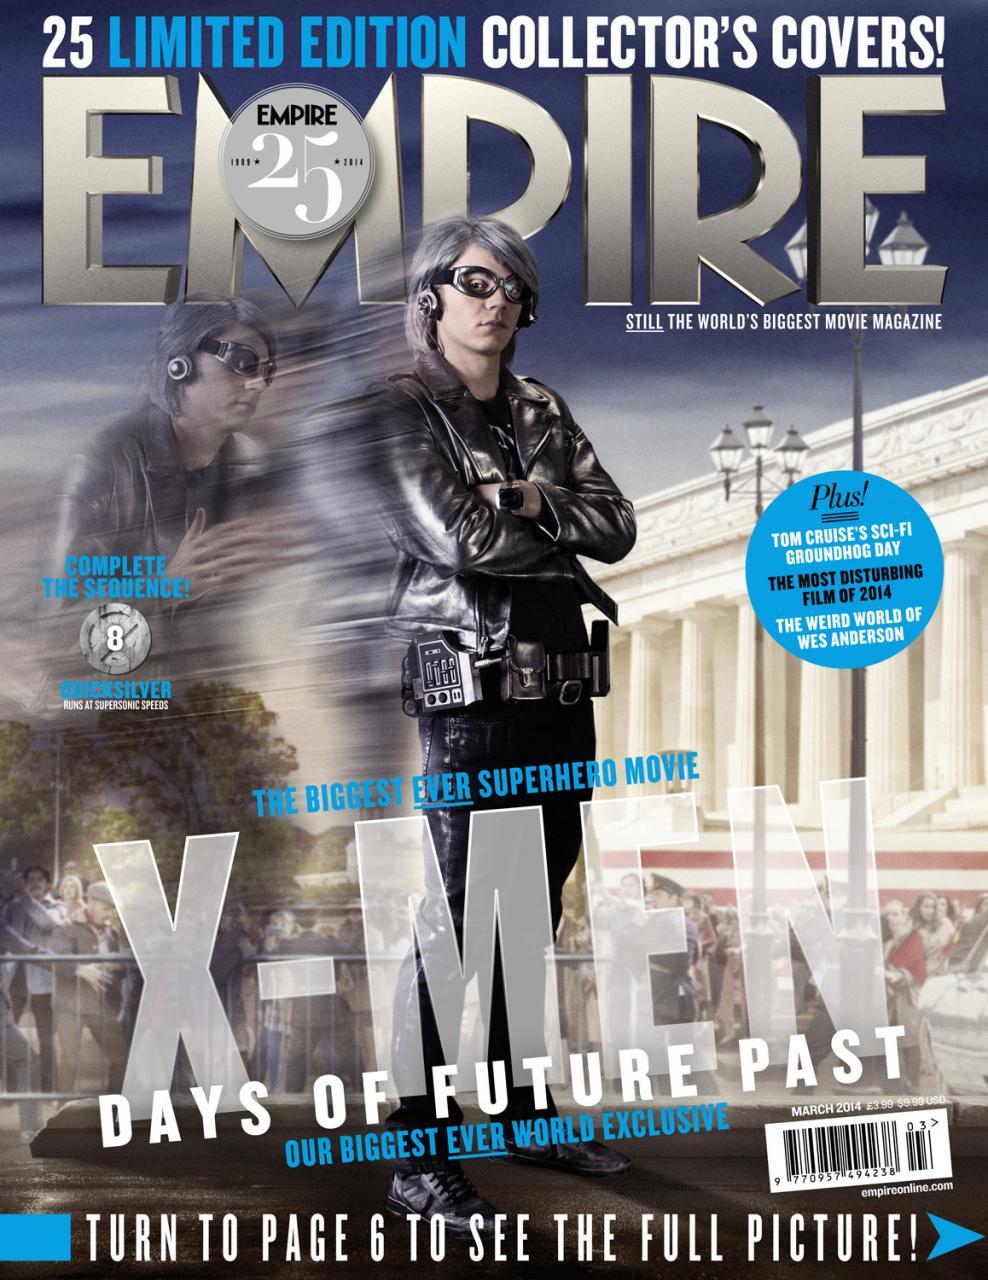 X-MEN DAYS OF FUTURE PAST Empire Magazine Covers  (10)